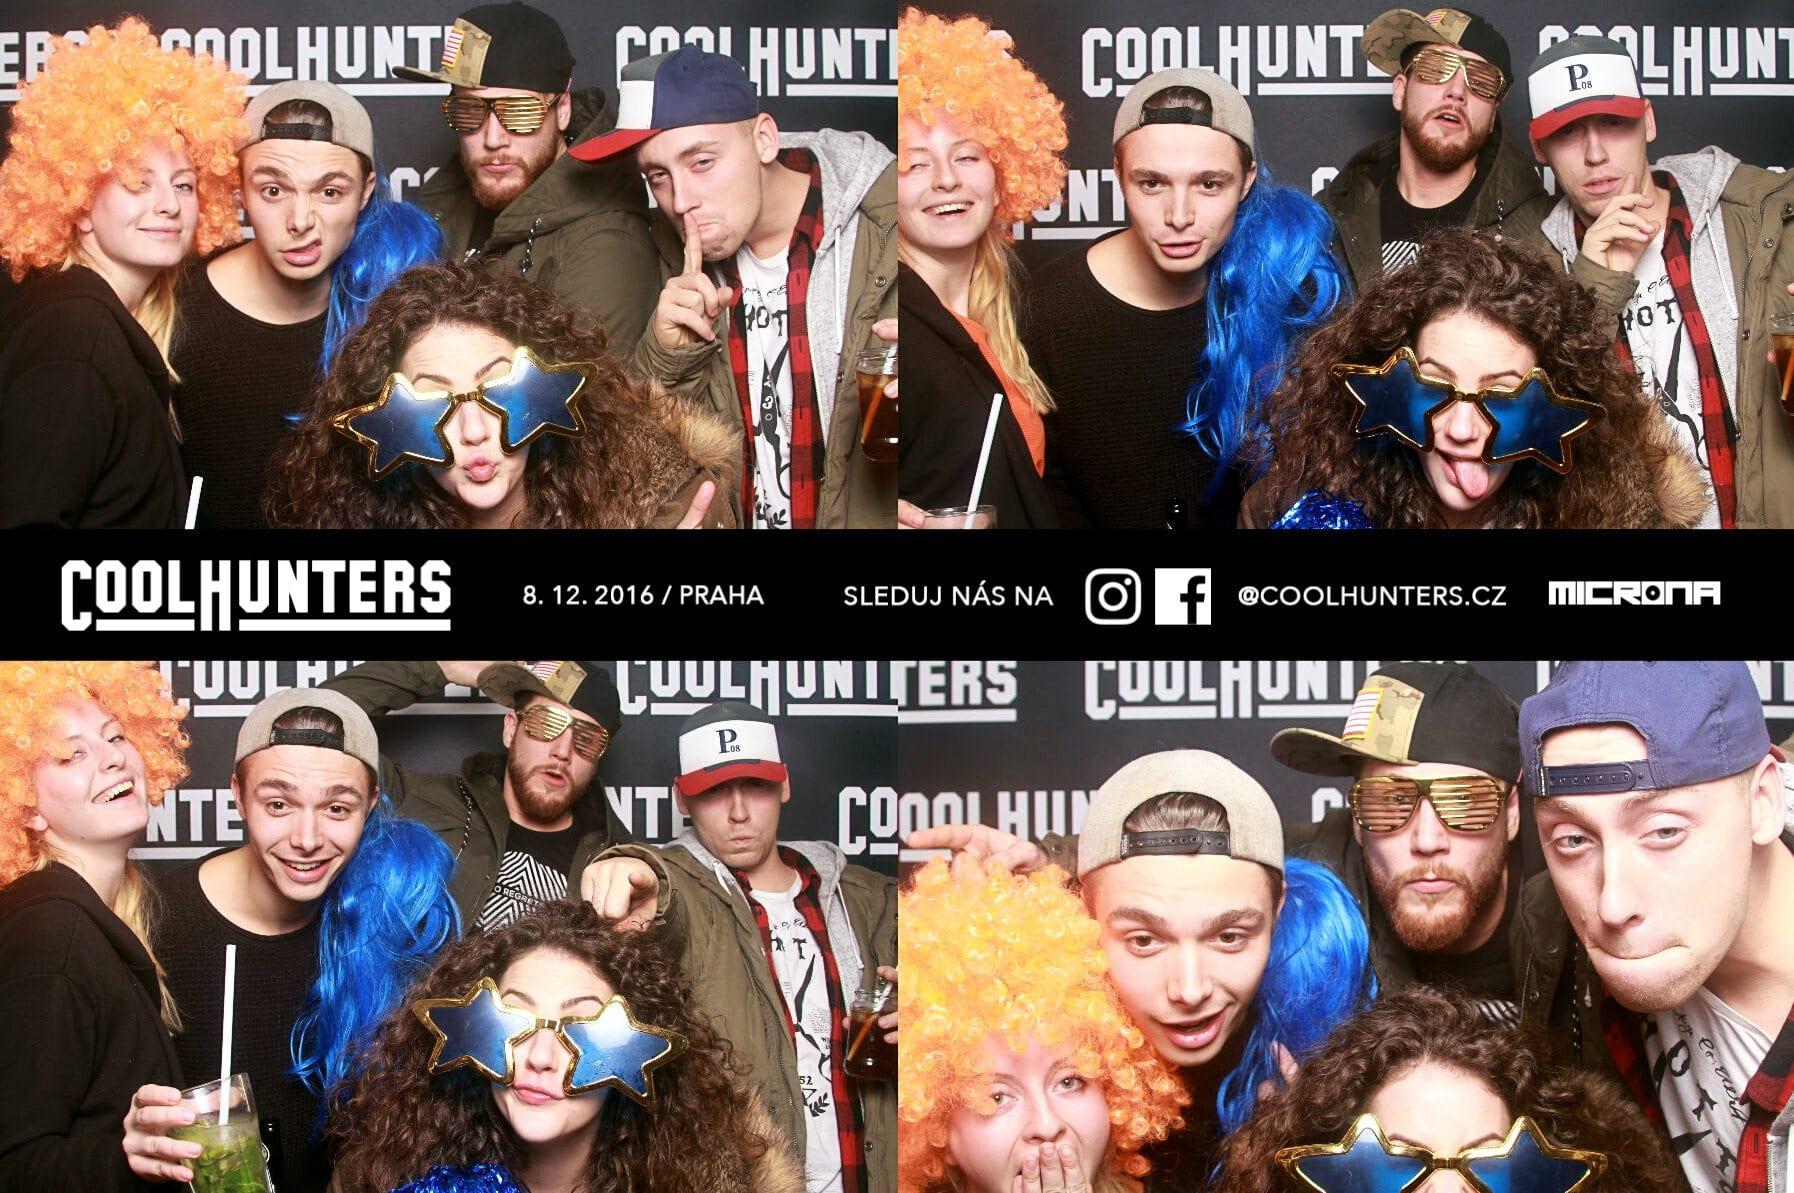 fotokoutek-coolhunters-microna-8-12-2016-176611